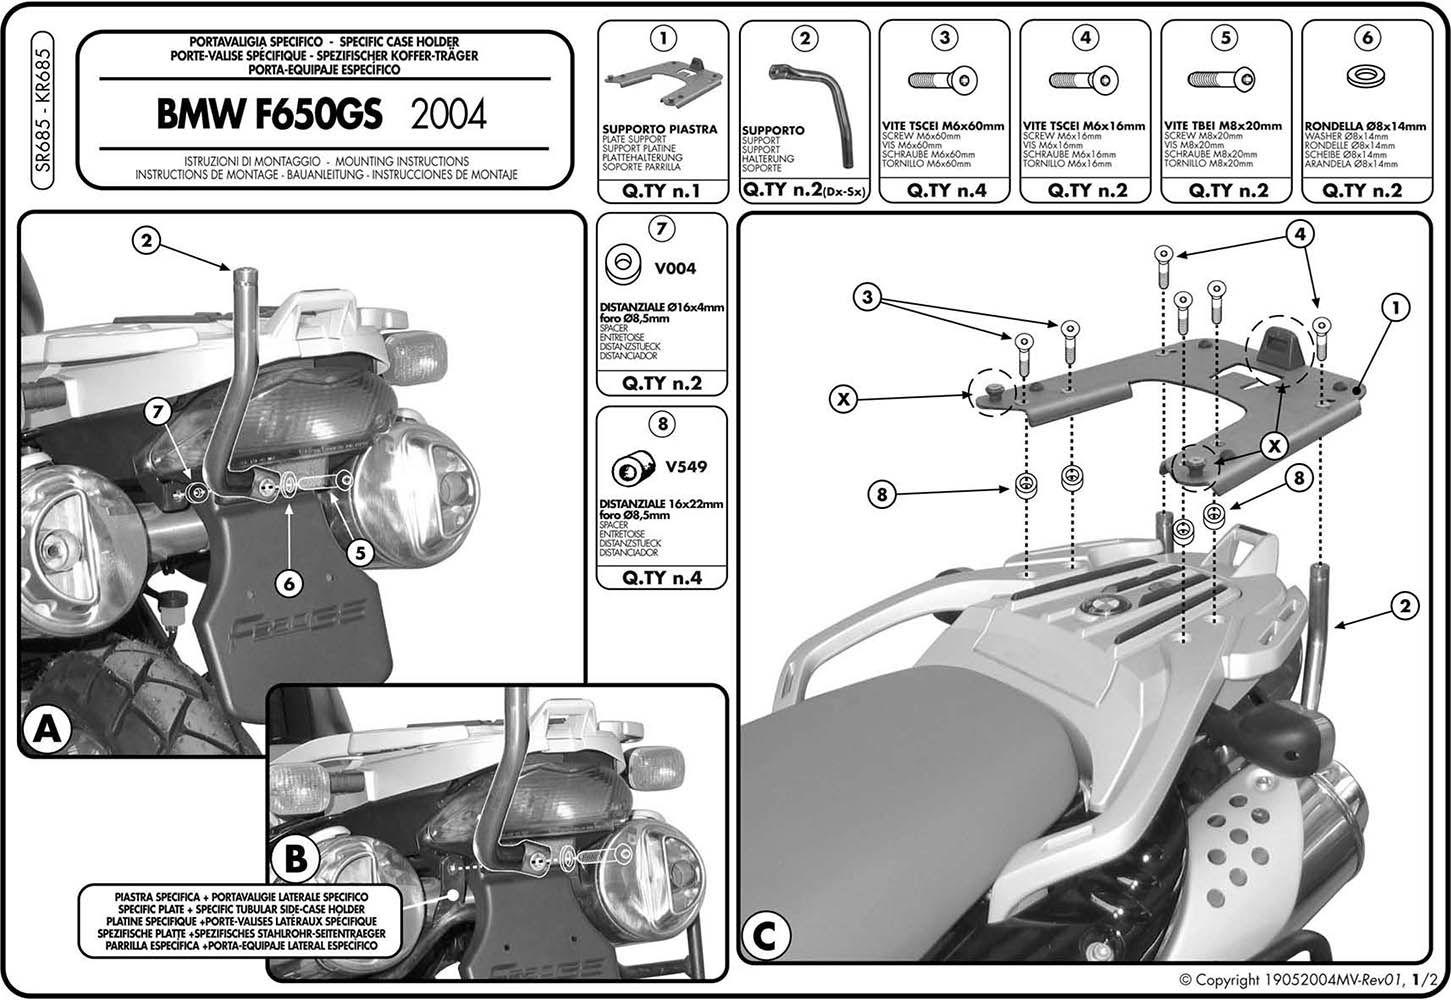 Bagageiro Rack Chapa Bmw G 650 Gs/ F 650 Gs 2010/ Sr 685